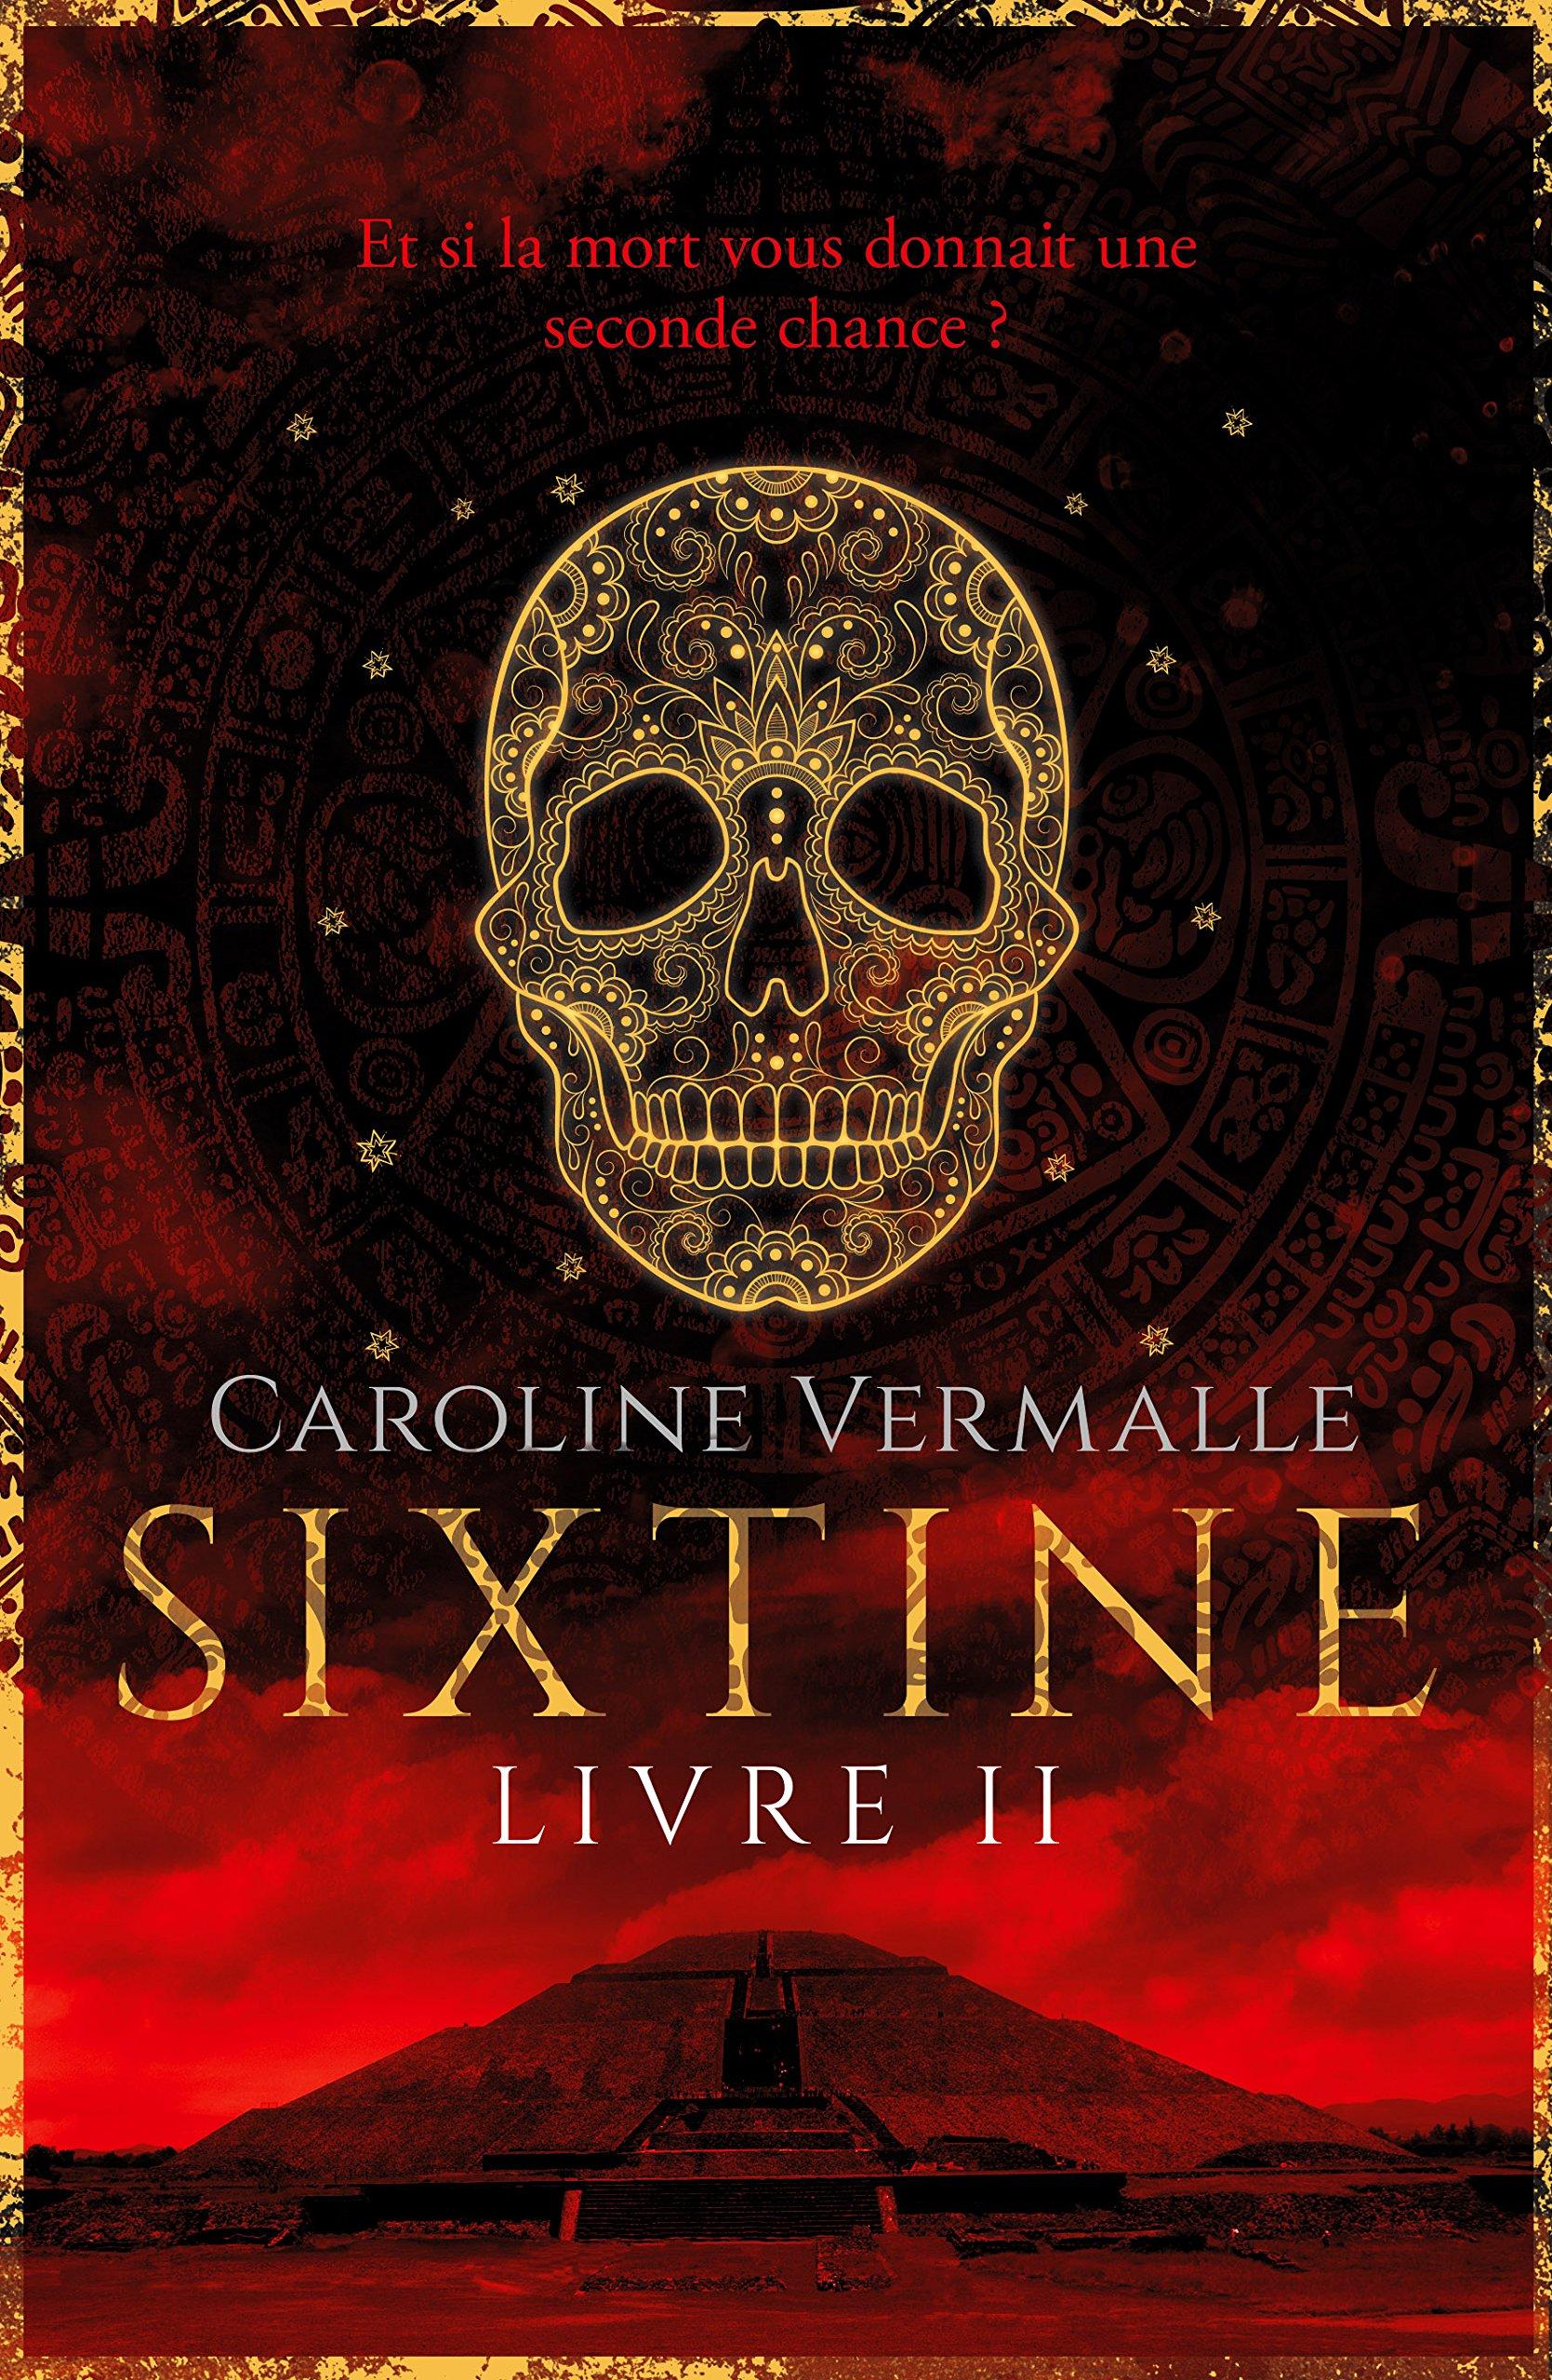 Sixtine - Livre II por Caroline Vermalle